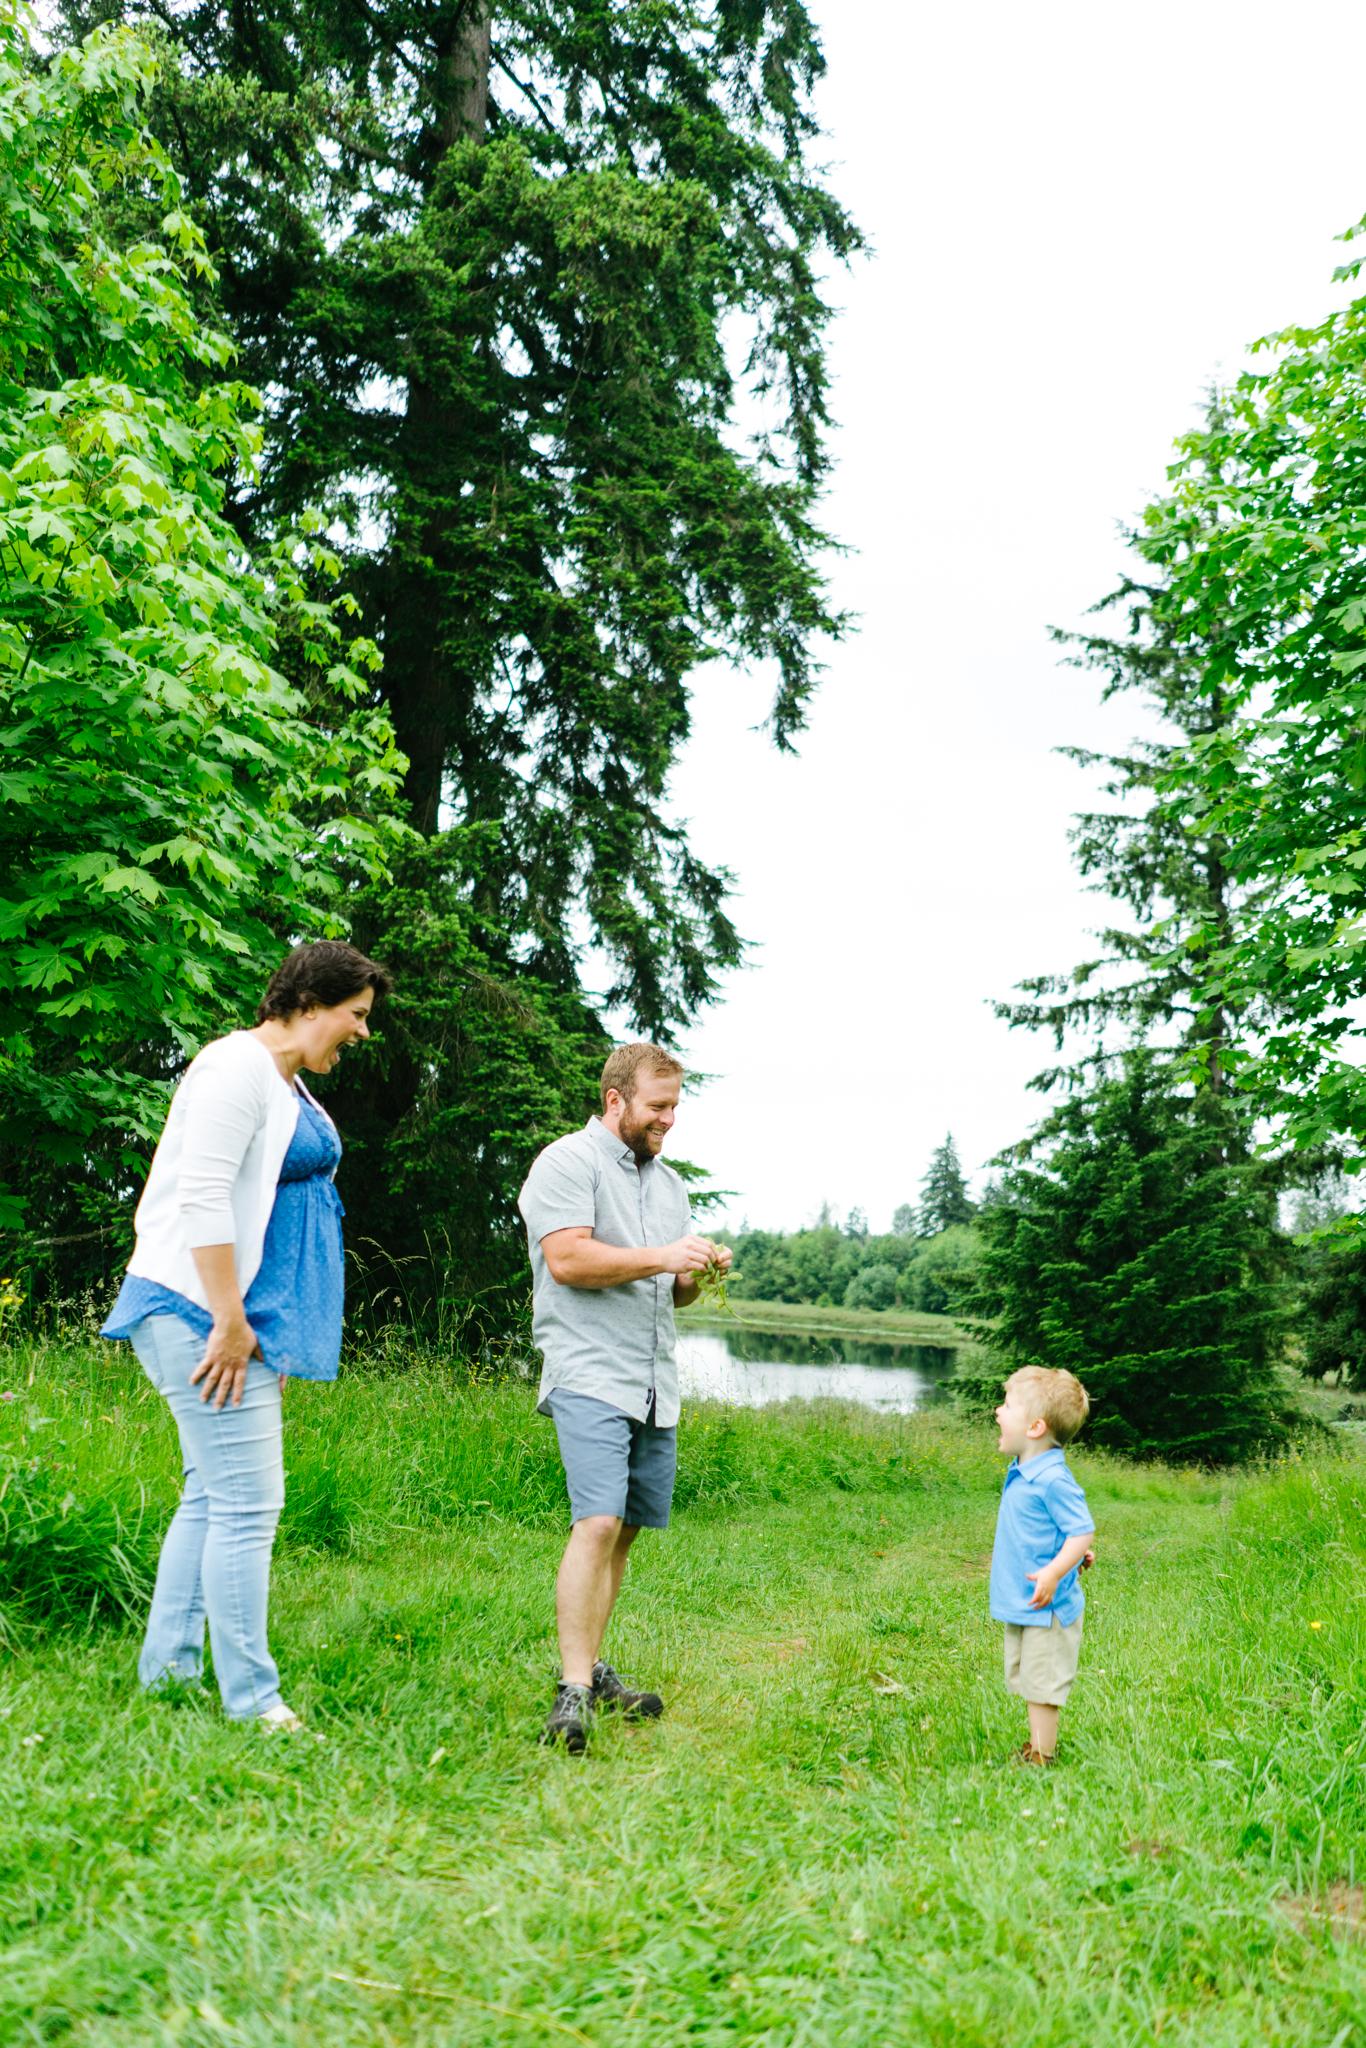 Family Photography Portrait Session at Clark Lake Park in Kent, Washington